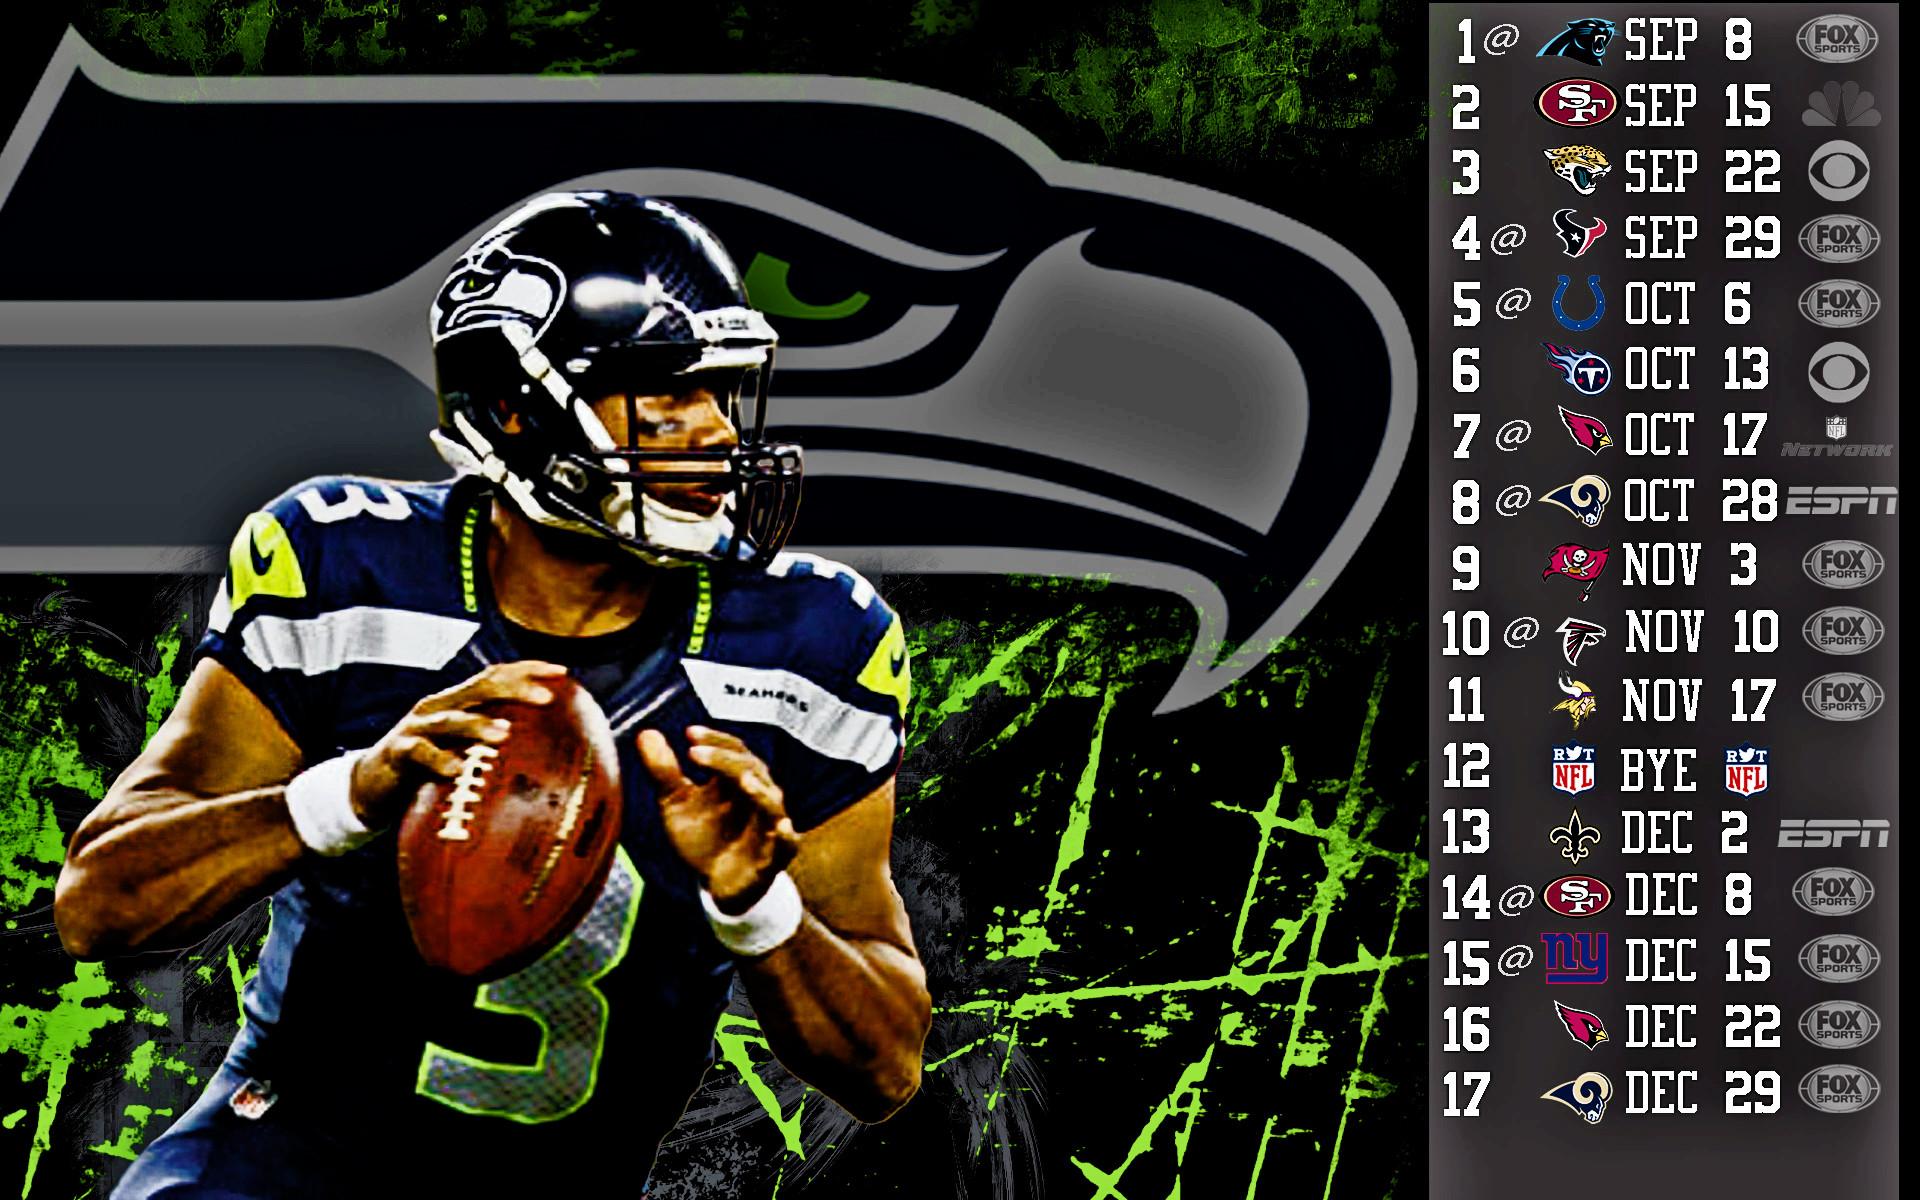 2013 Seatlle Seahawks football nfl d wallpaper | | 130429 |  WallpaperUP